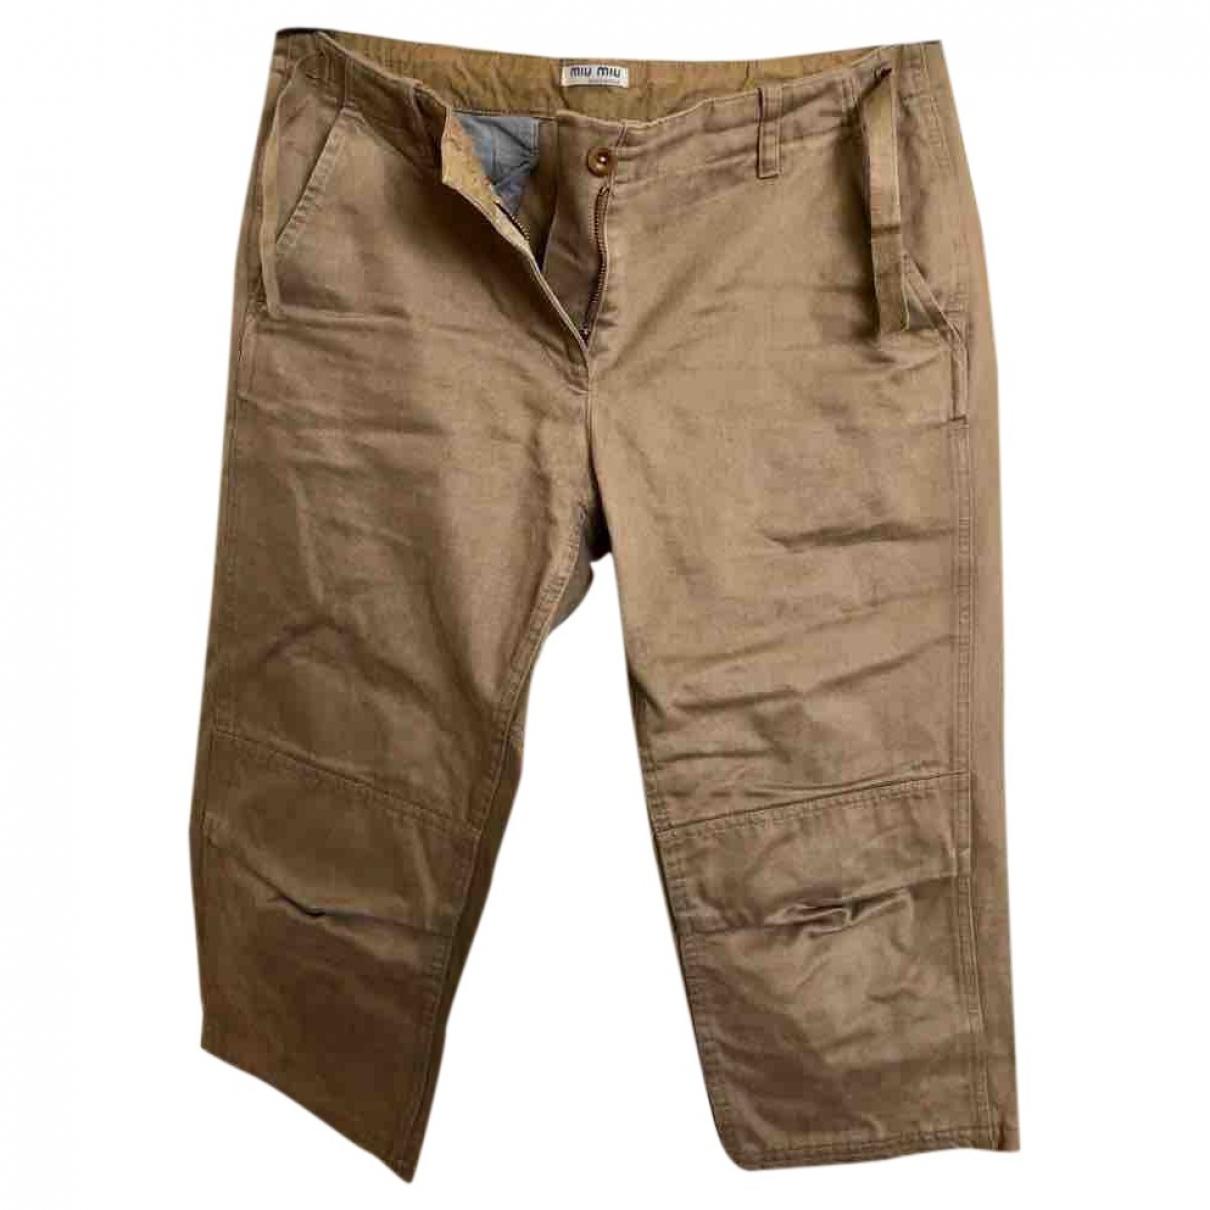 Miu Miu \N Beige Cotton Shorts for Women M International